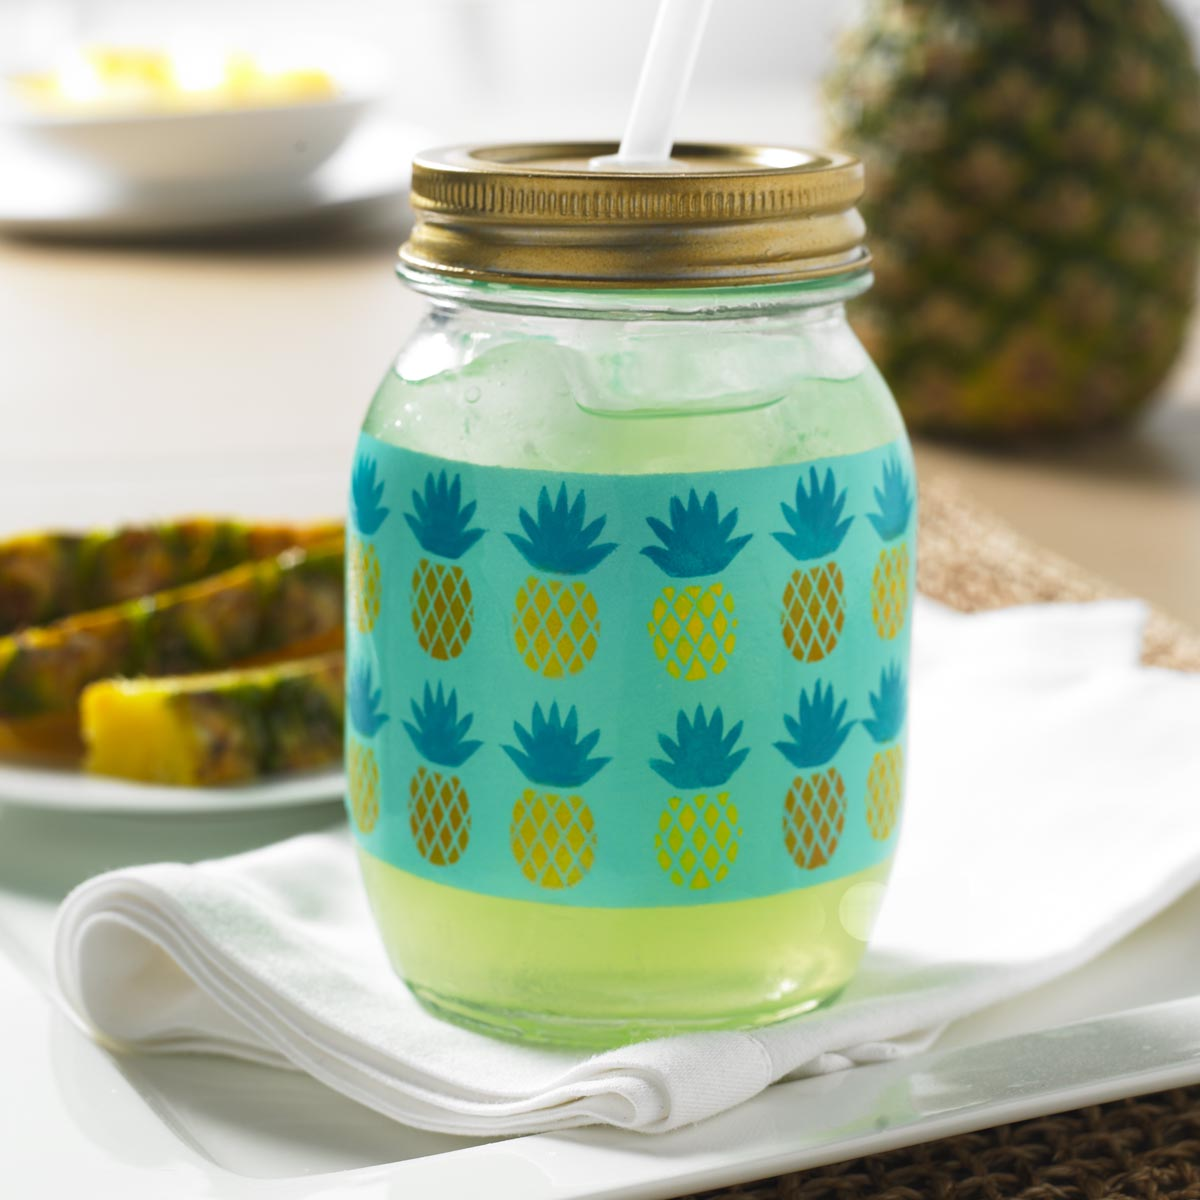 FolkArt ® Painting Stencils - Small - Pineapple